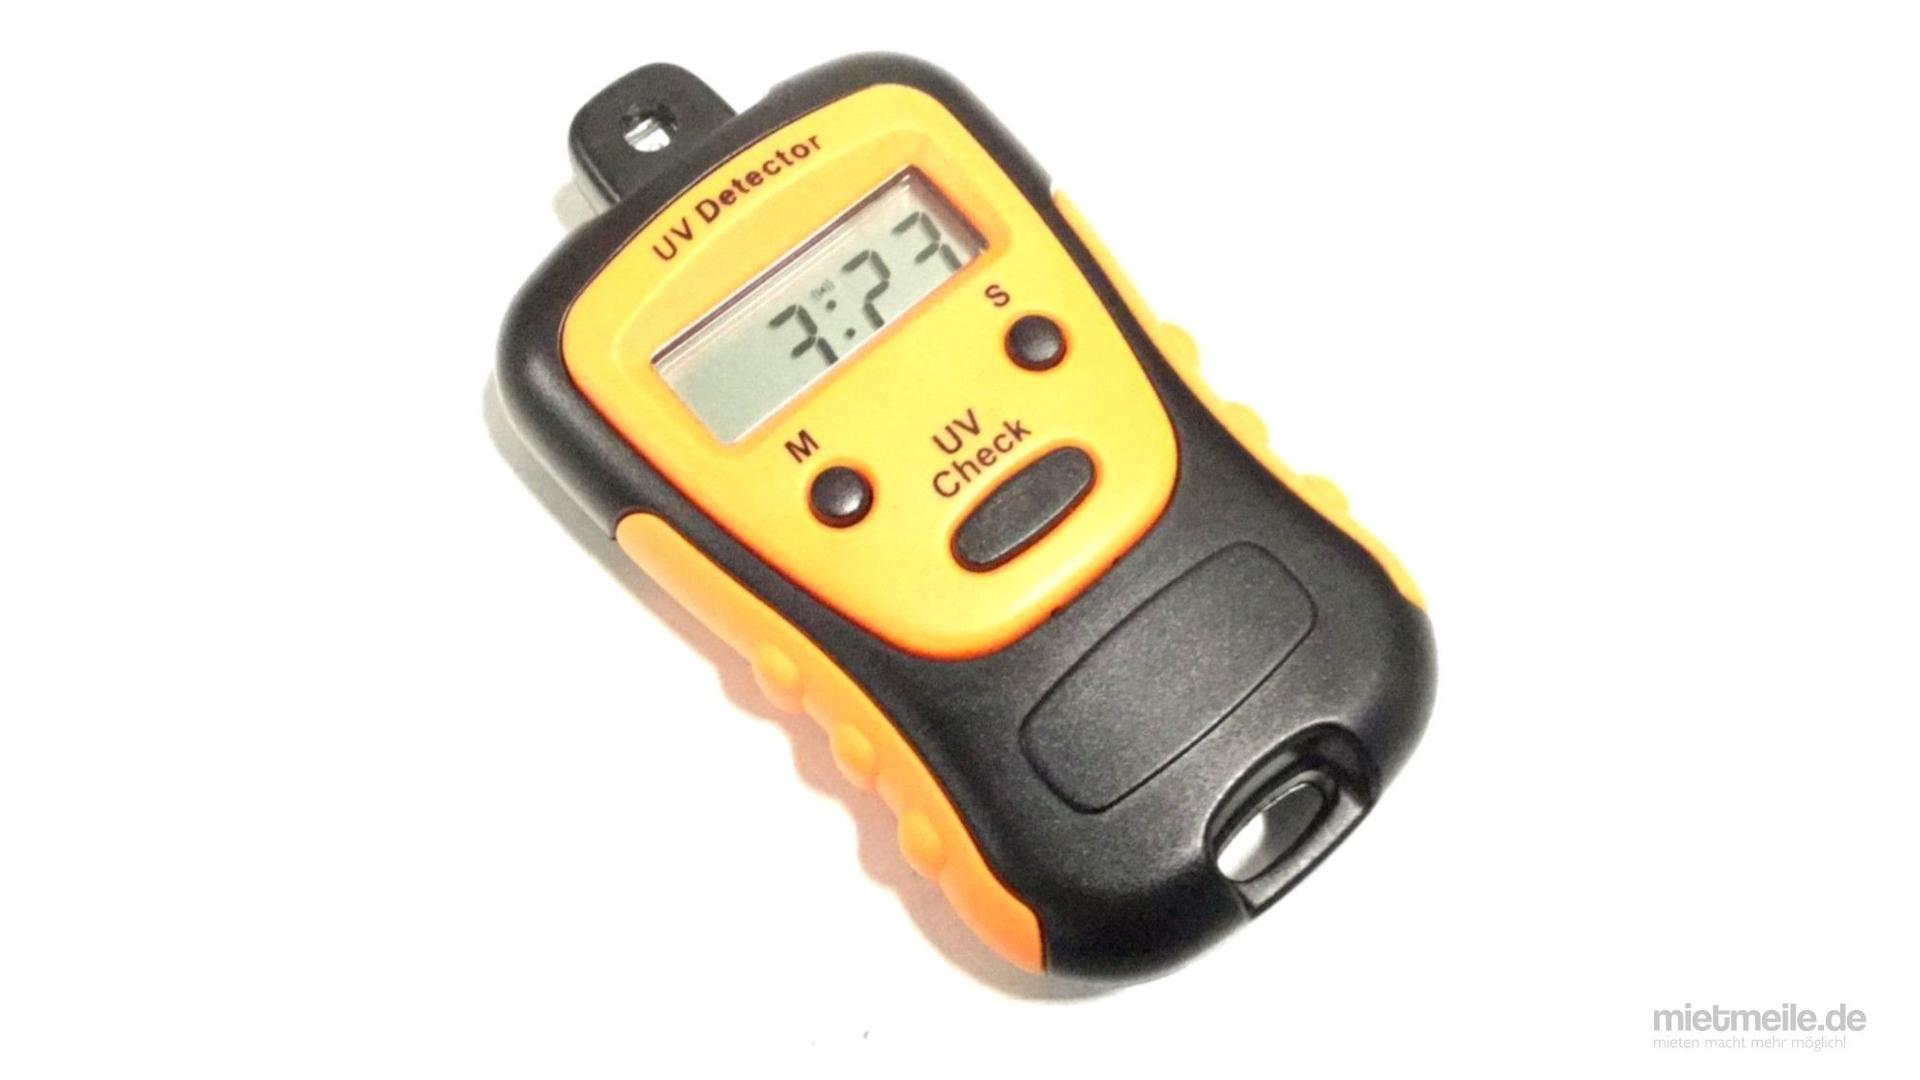 Elektronikzubehör mieten & vermieten - UV Messgerät Photometer UV-Detektor in Schkeuditz